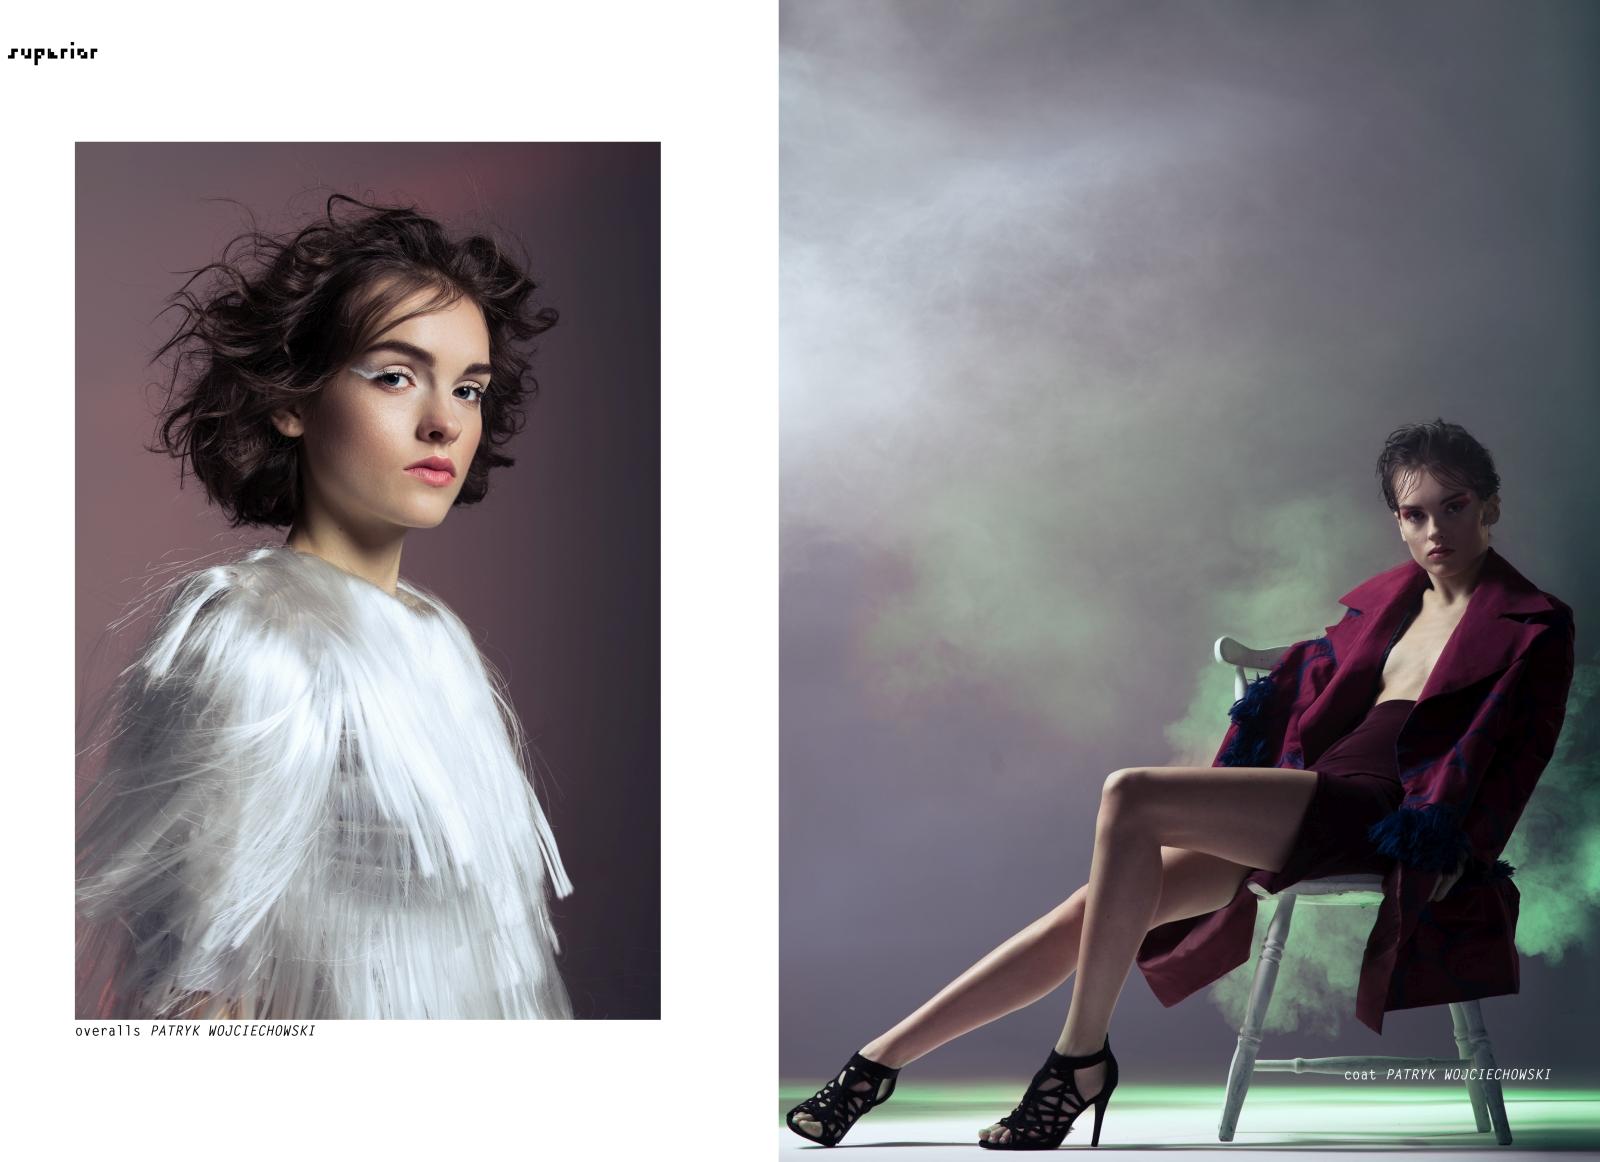 I-AM-THE-REBEL-Fashion-Editorial-by-ARTUR-MADEJ-5